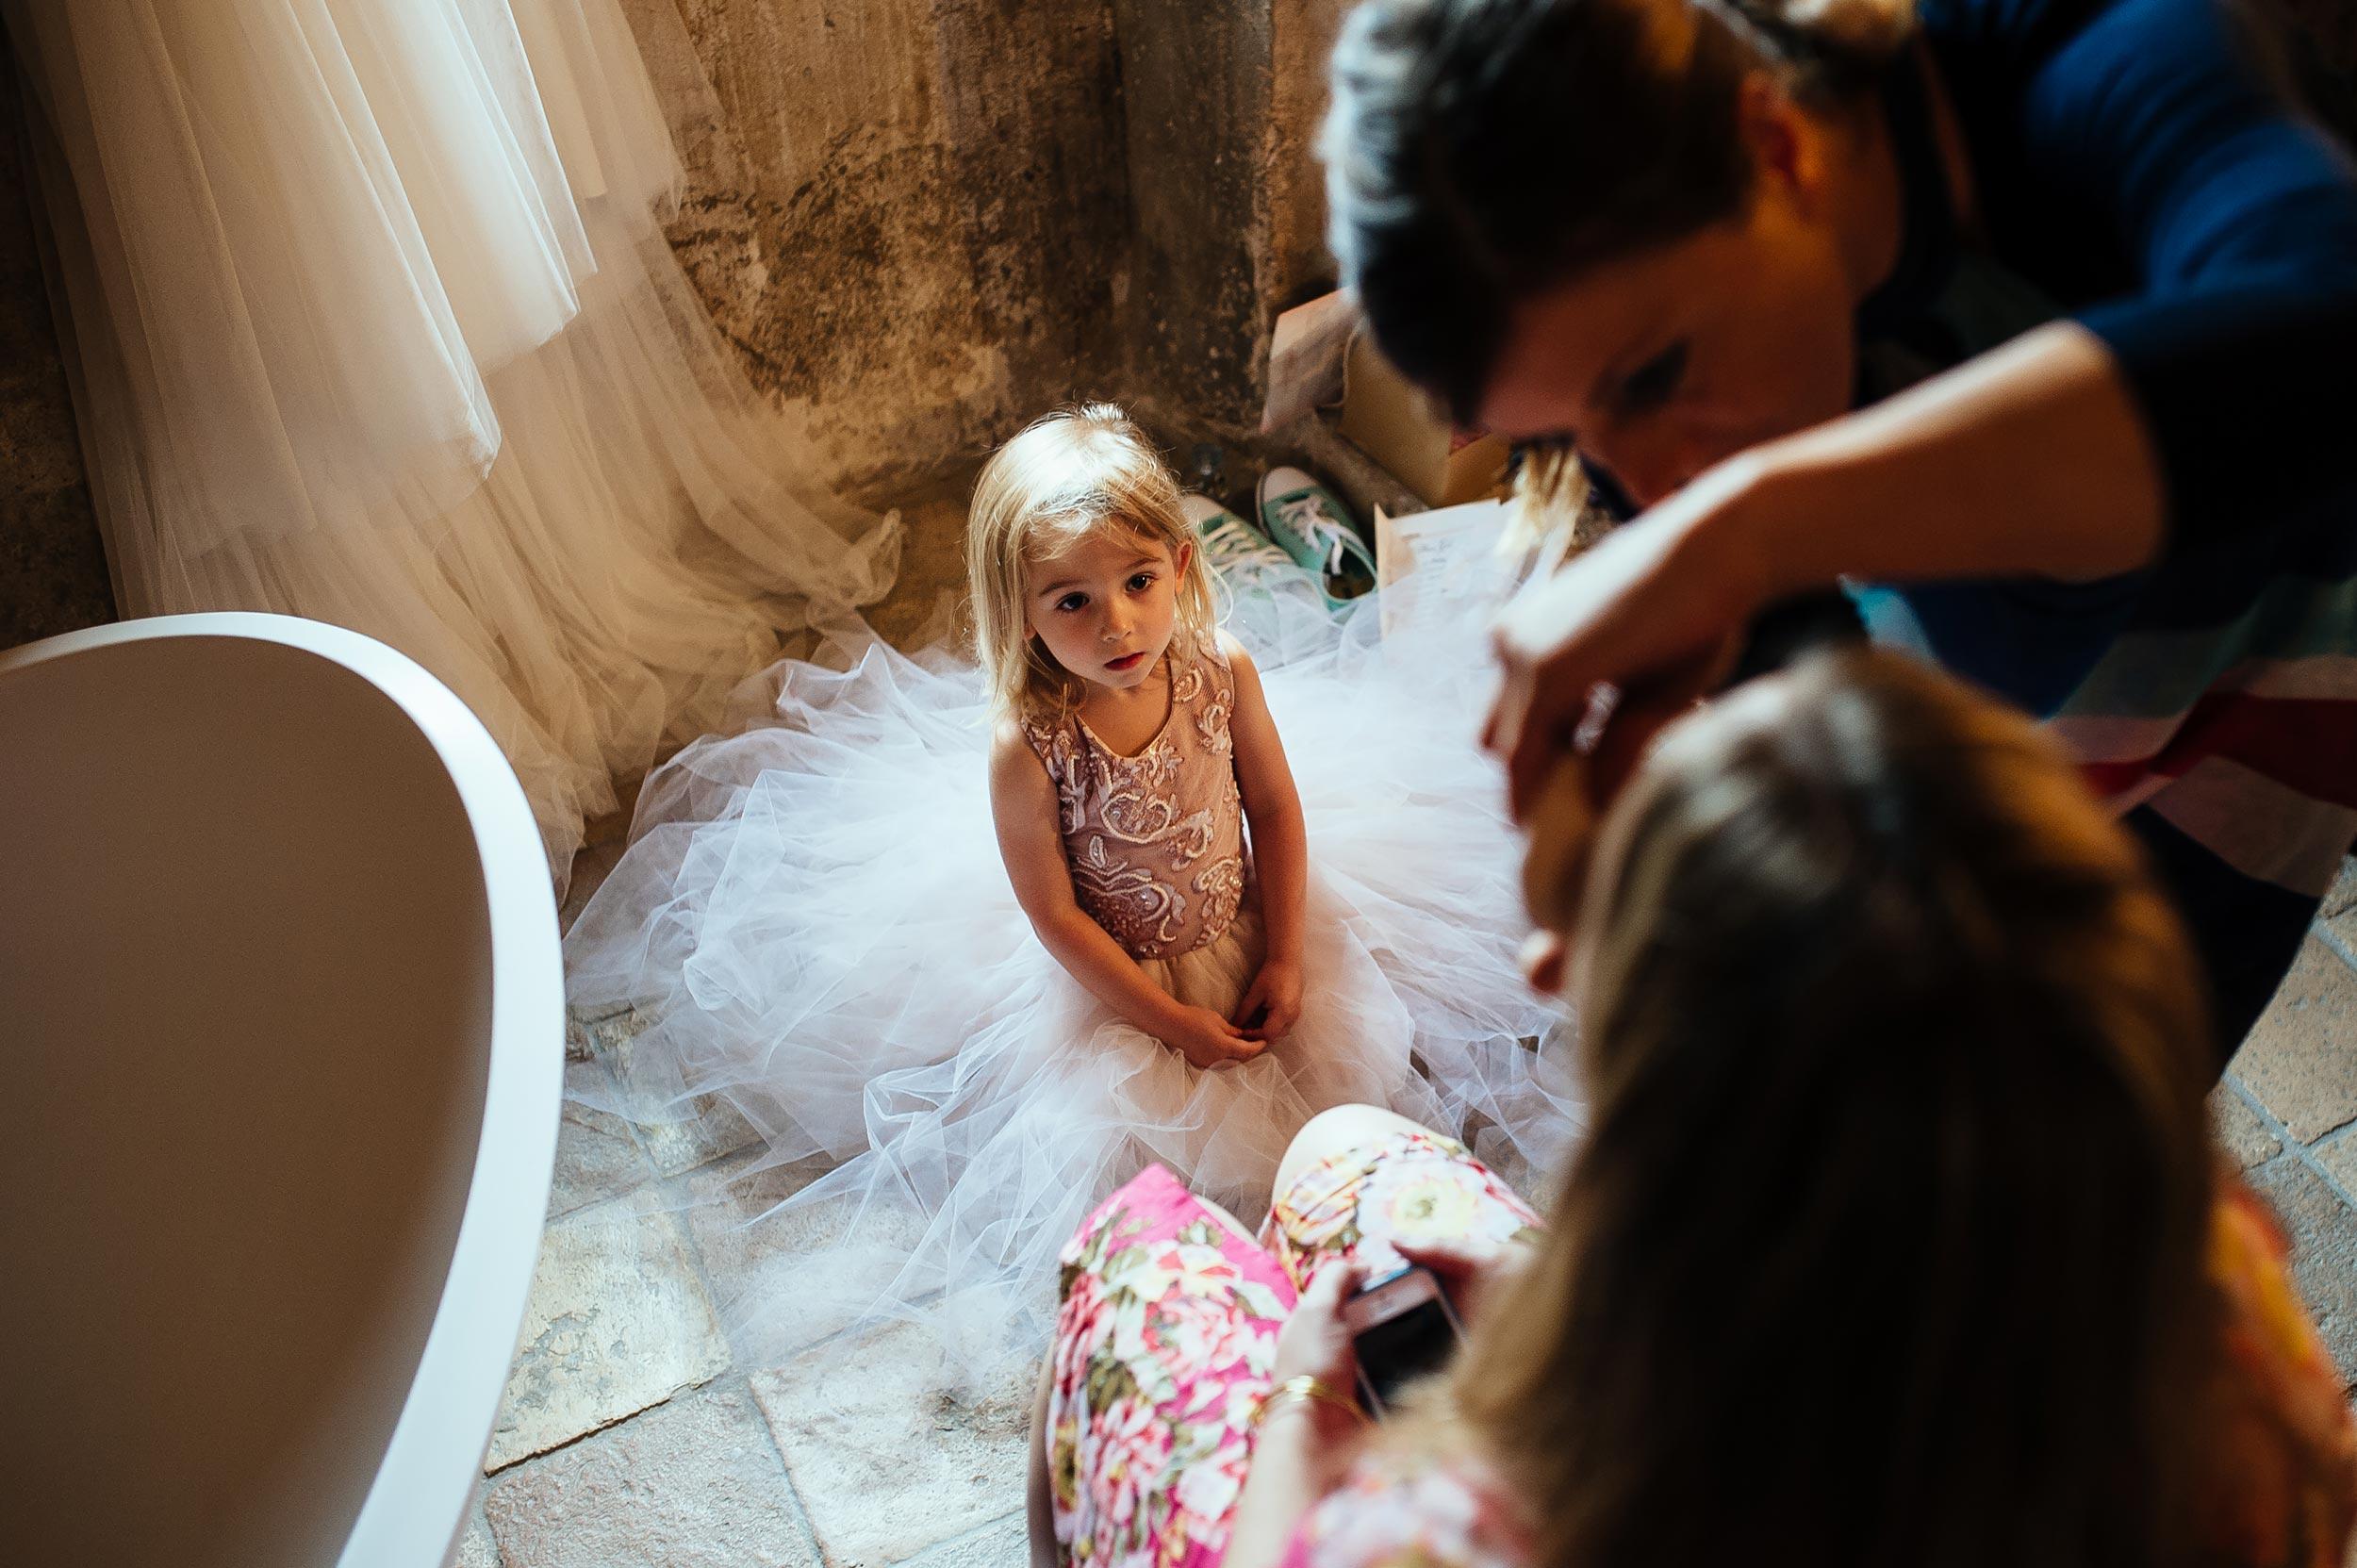 2014-Shelby-Jocelyn-Santo-Stefano-Di-Sessanio-Wedding-Photographer-Italy-Alessandro-Avenali-19.jpg